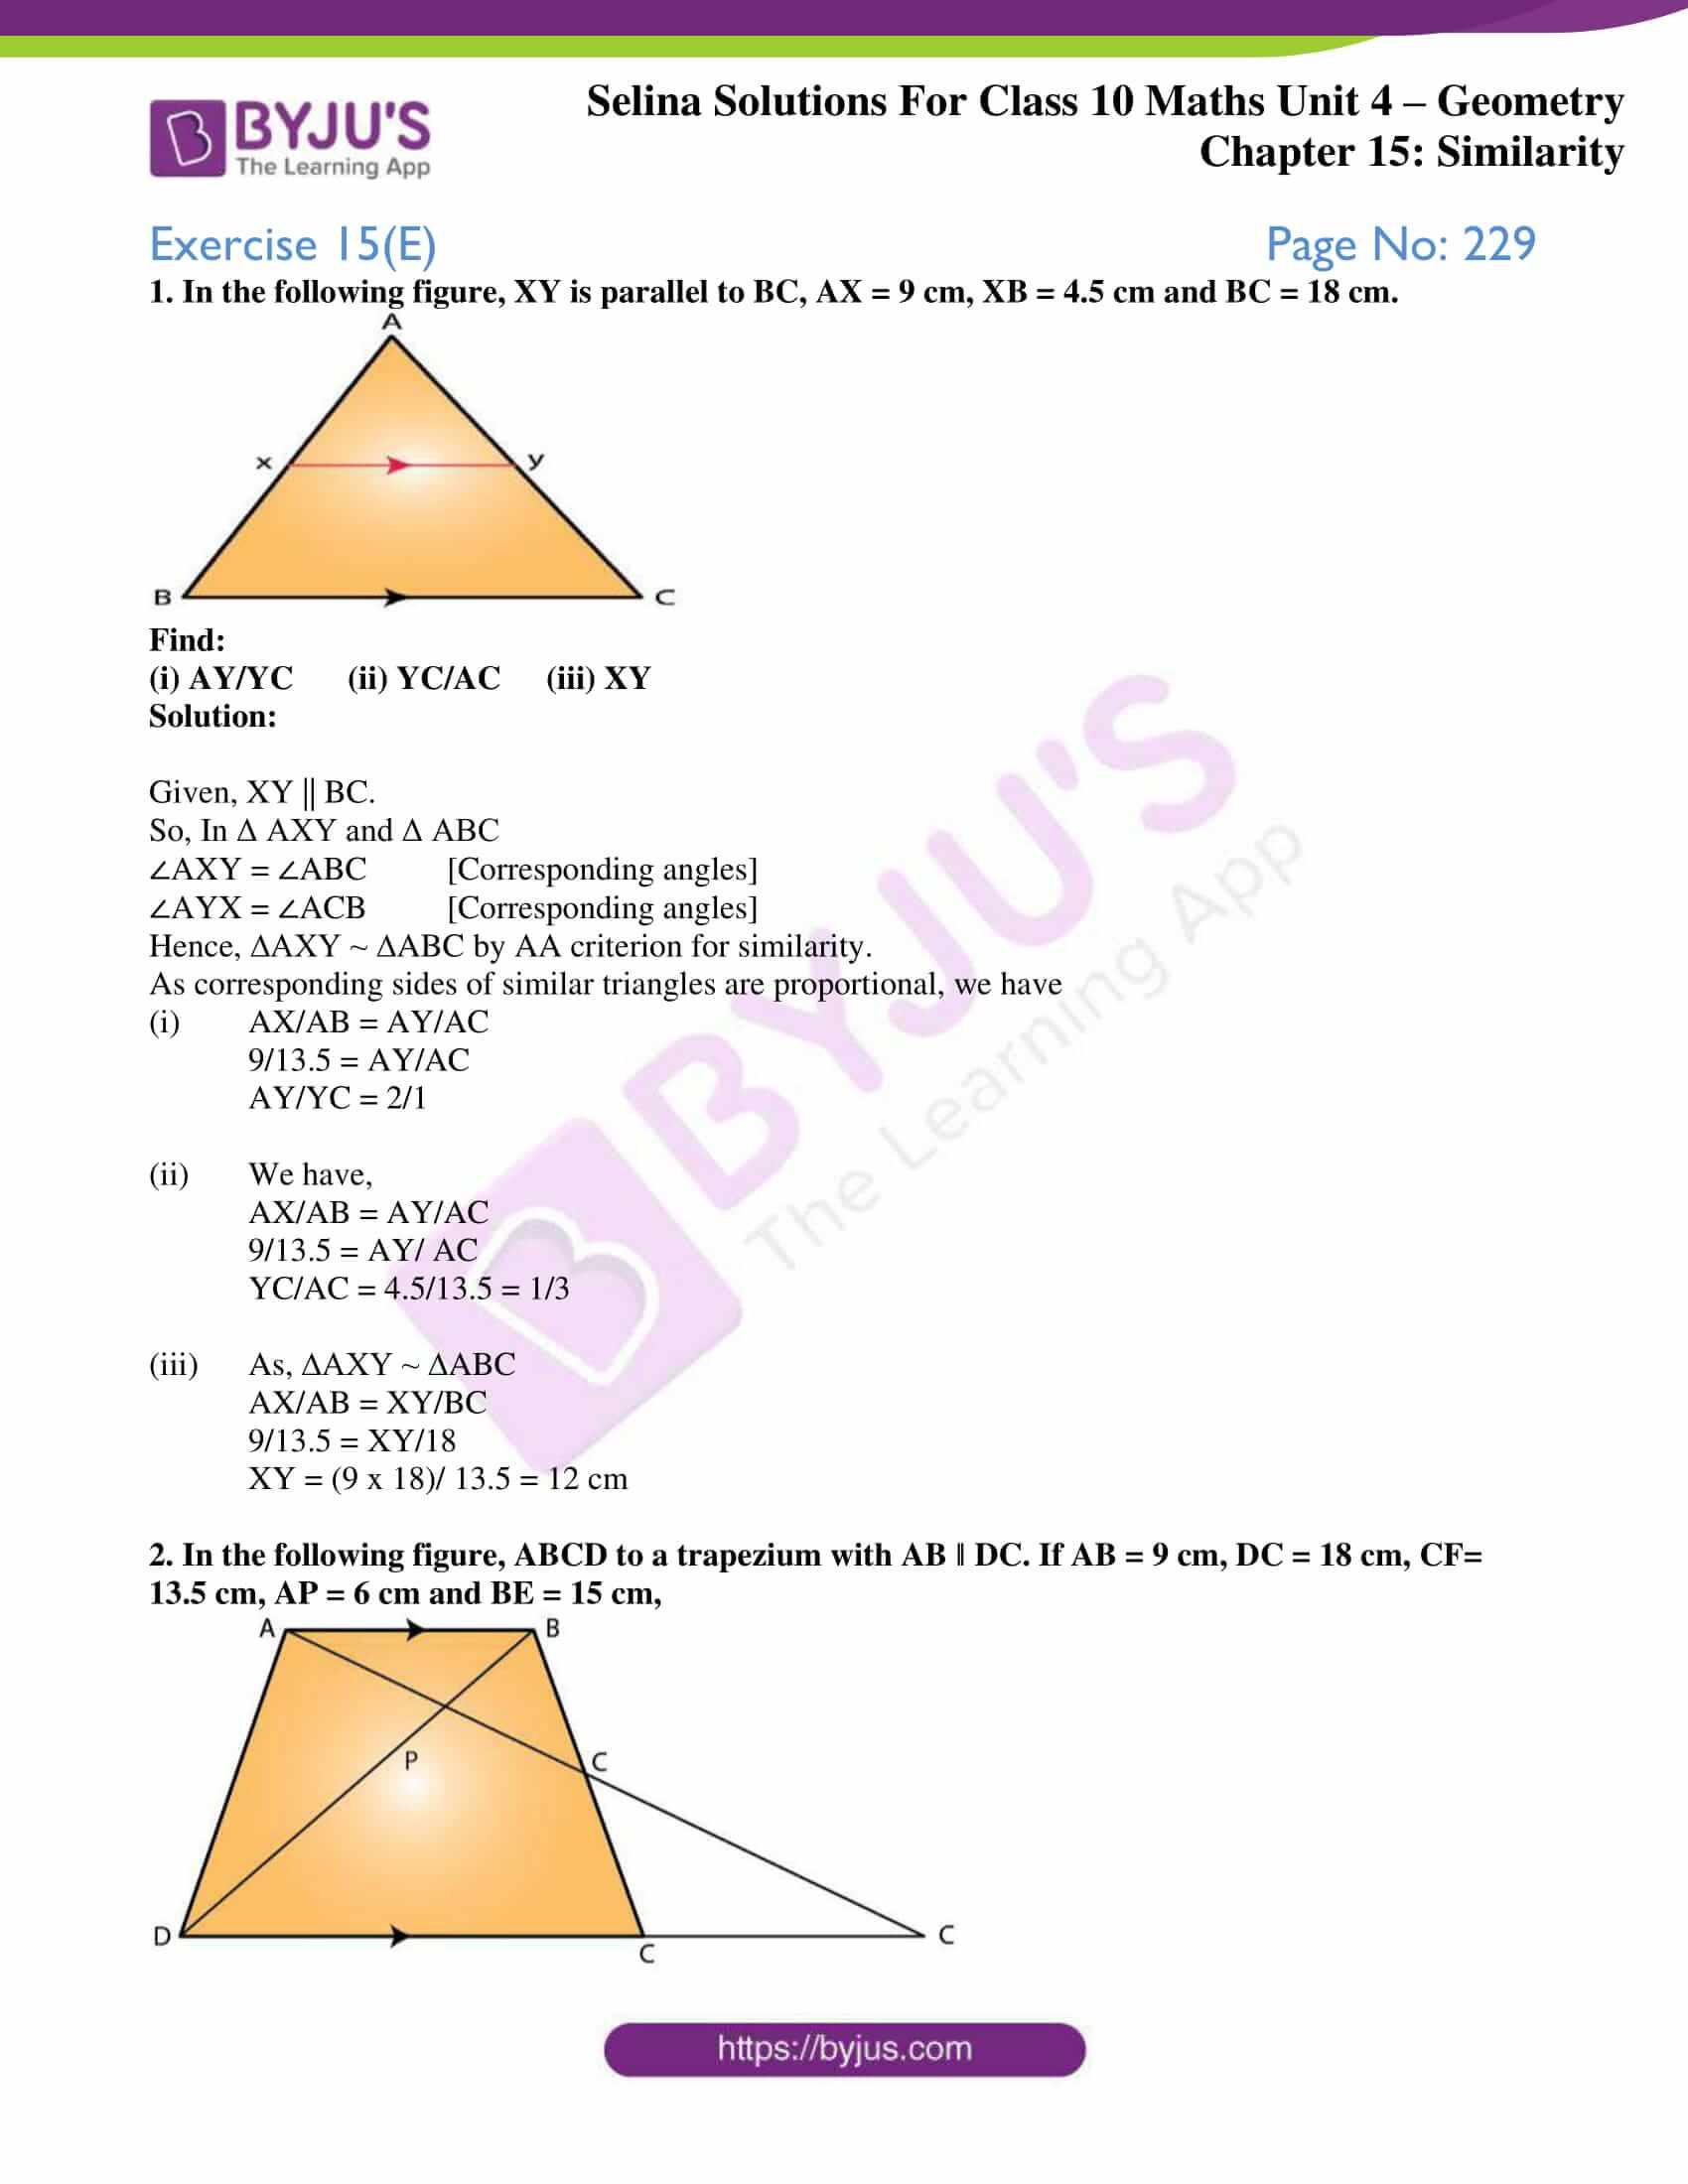 selina-sol-maths-class-10-ch-15-ex-e-1